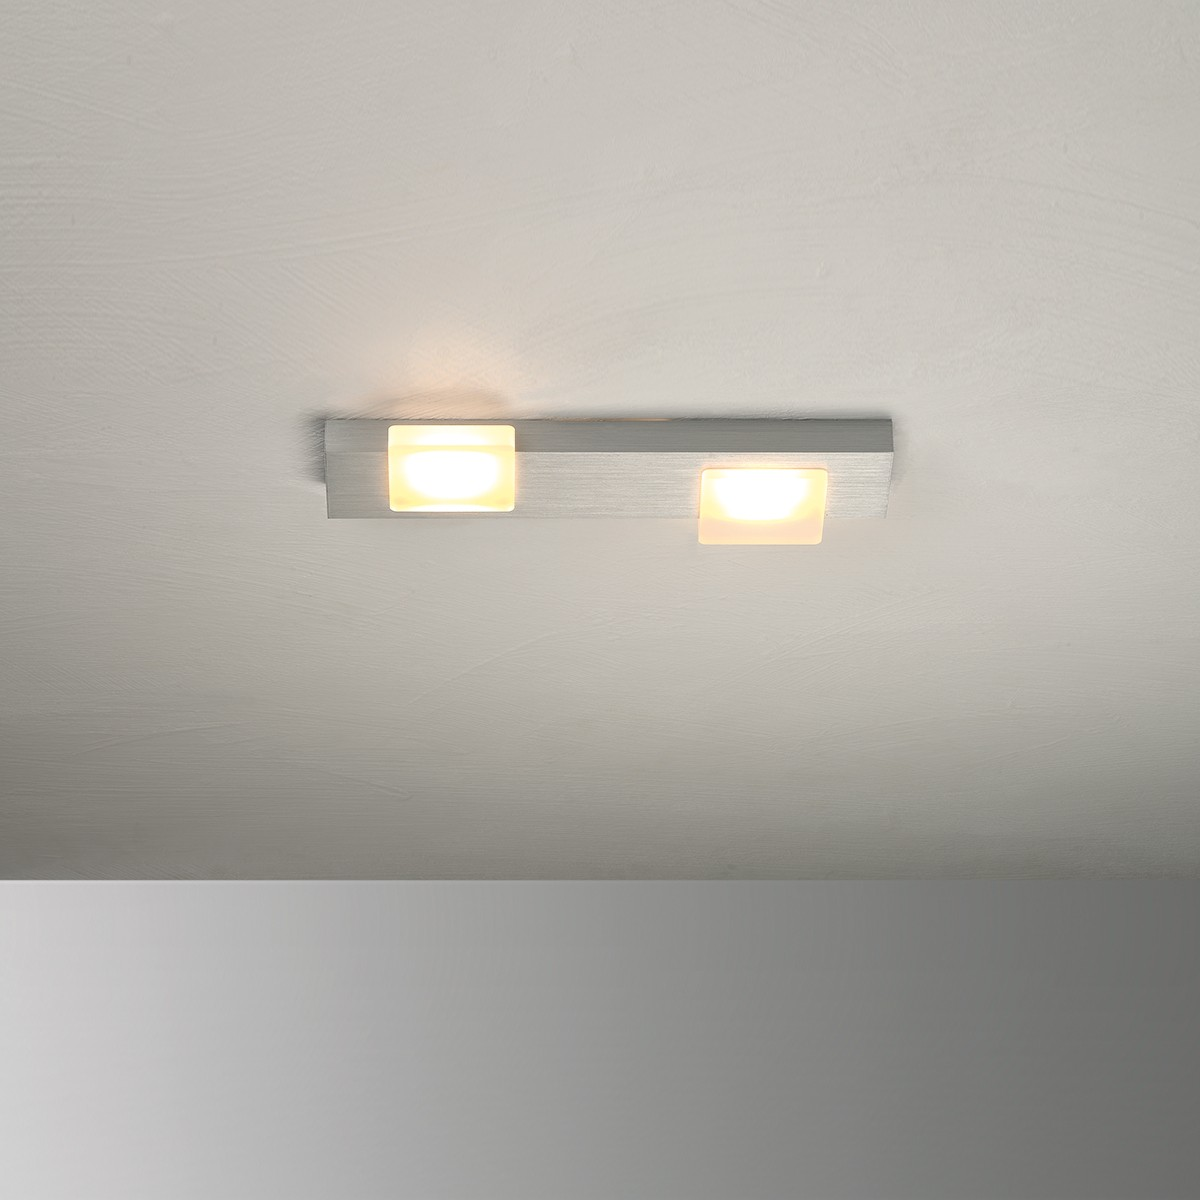 Bopp Lamina LED Deckenleuchte 2-flg., Aluminium geschliffen